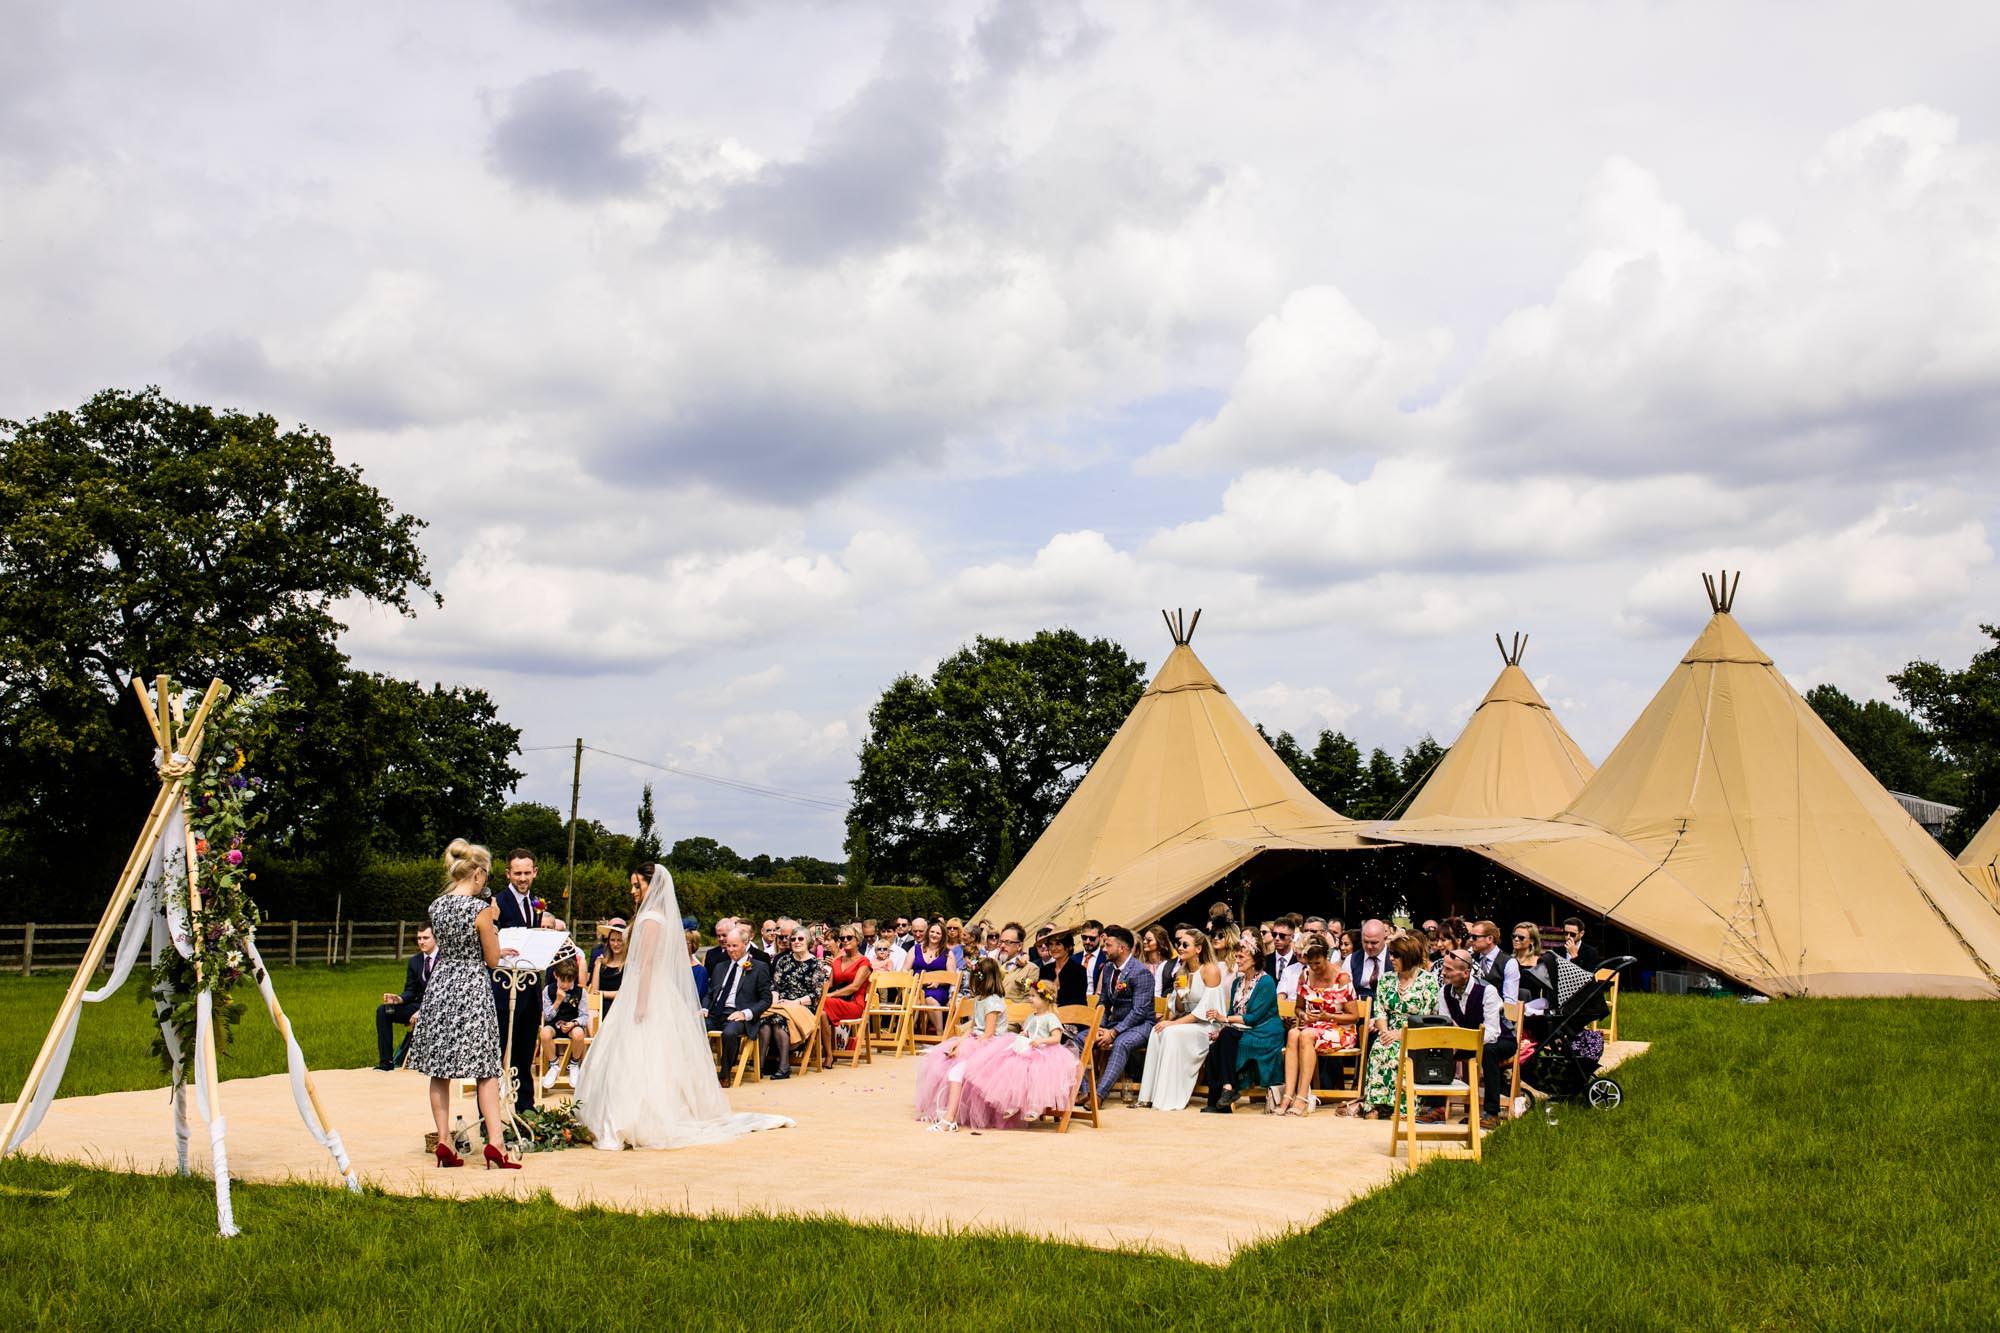 Penney Fields Tipi Wedding